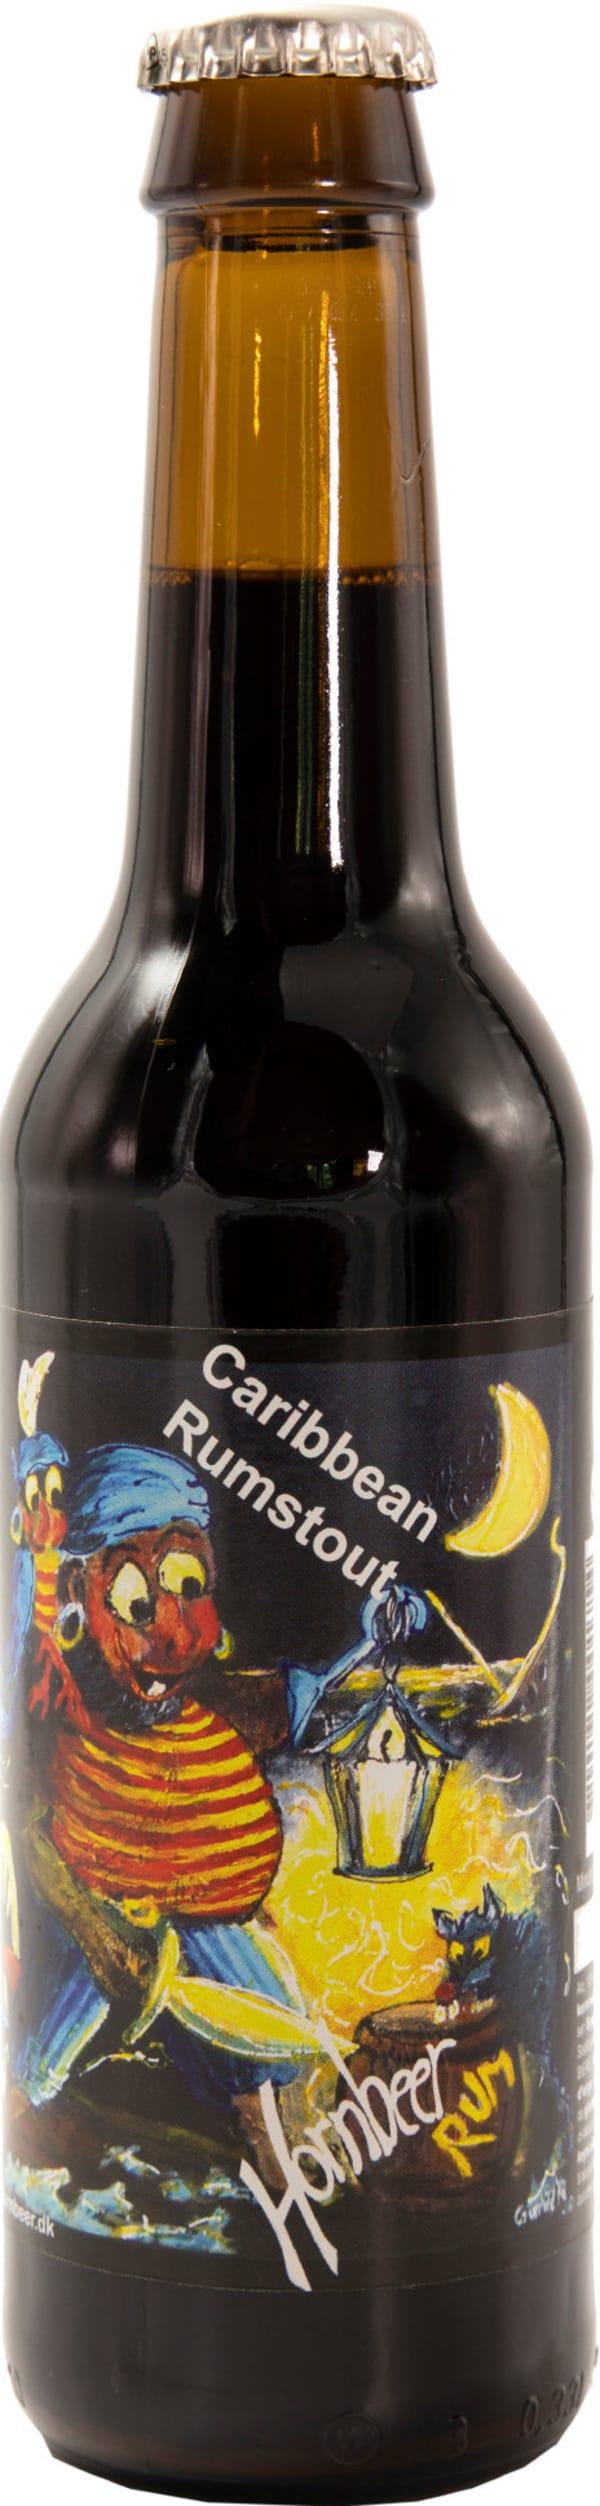 Hornbeer Caribbean Rumstout